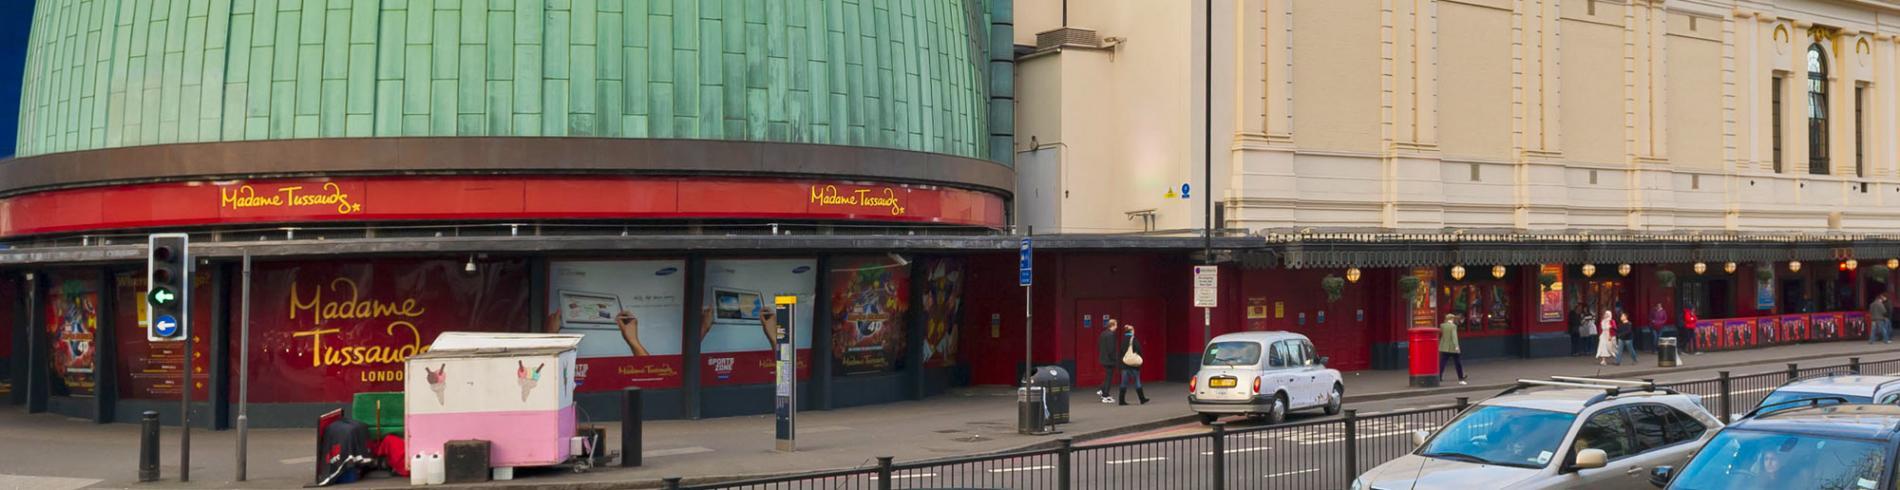 Madame Tussauds museum's facade